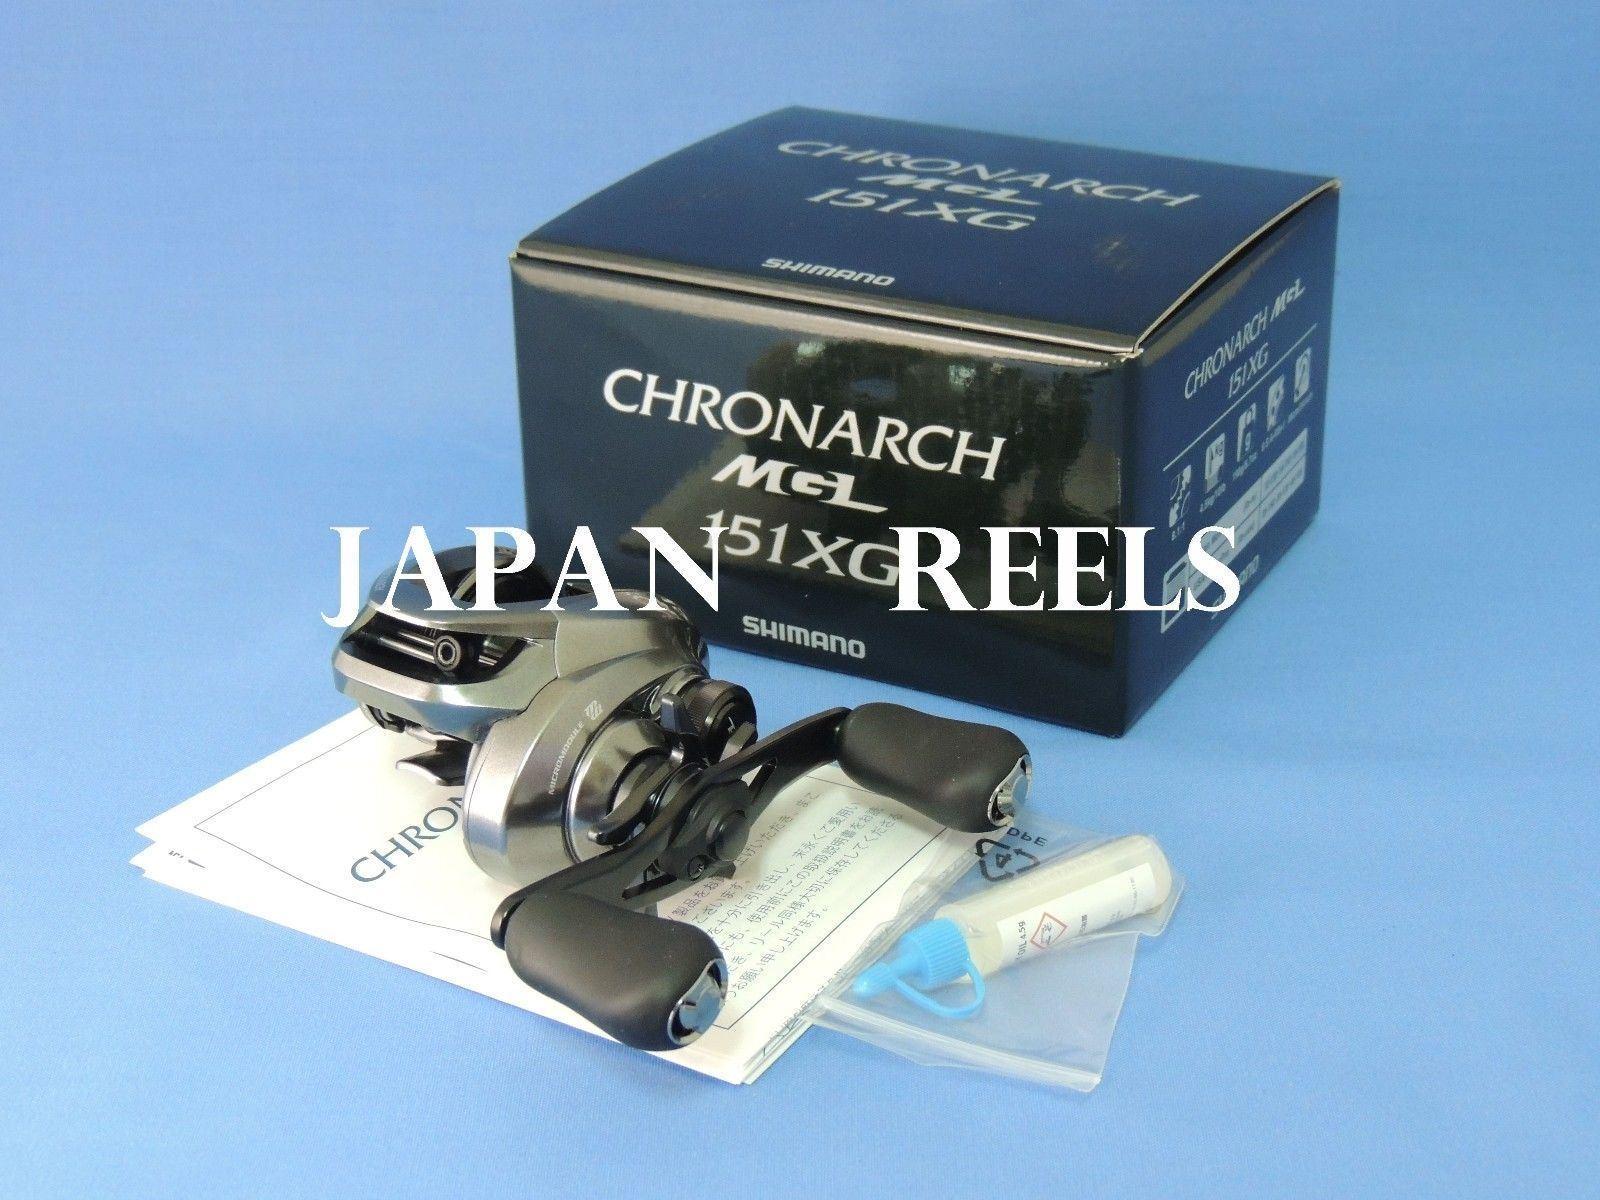 NEW SHIMANO 17 CHRONARCH MGL 151XG 151 XG LEFT HANDLE 1-3 DAYS FAST DELIVERY